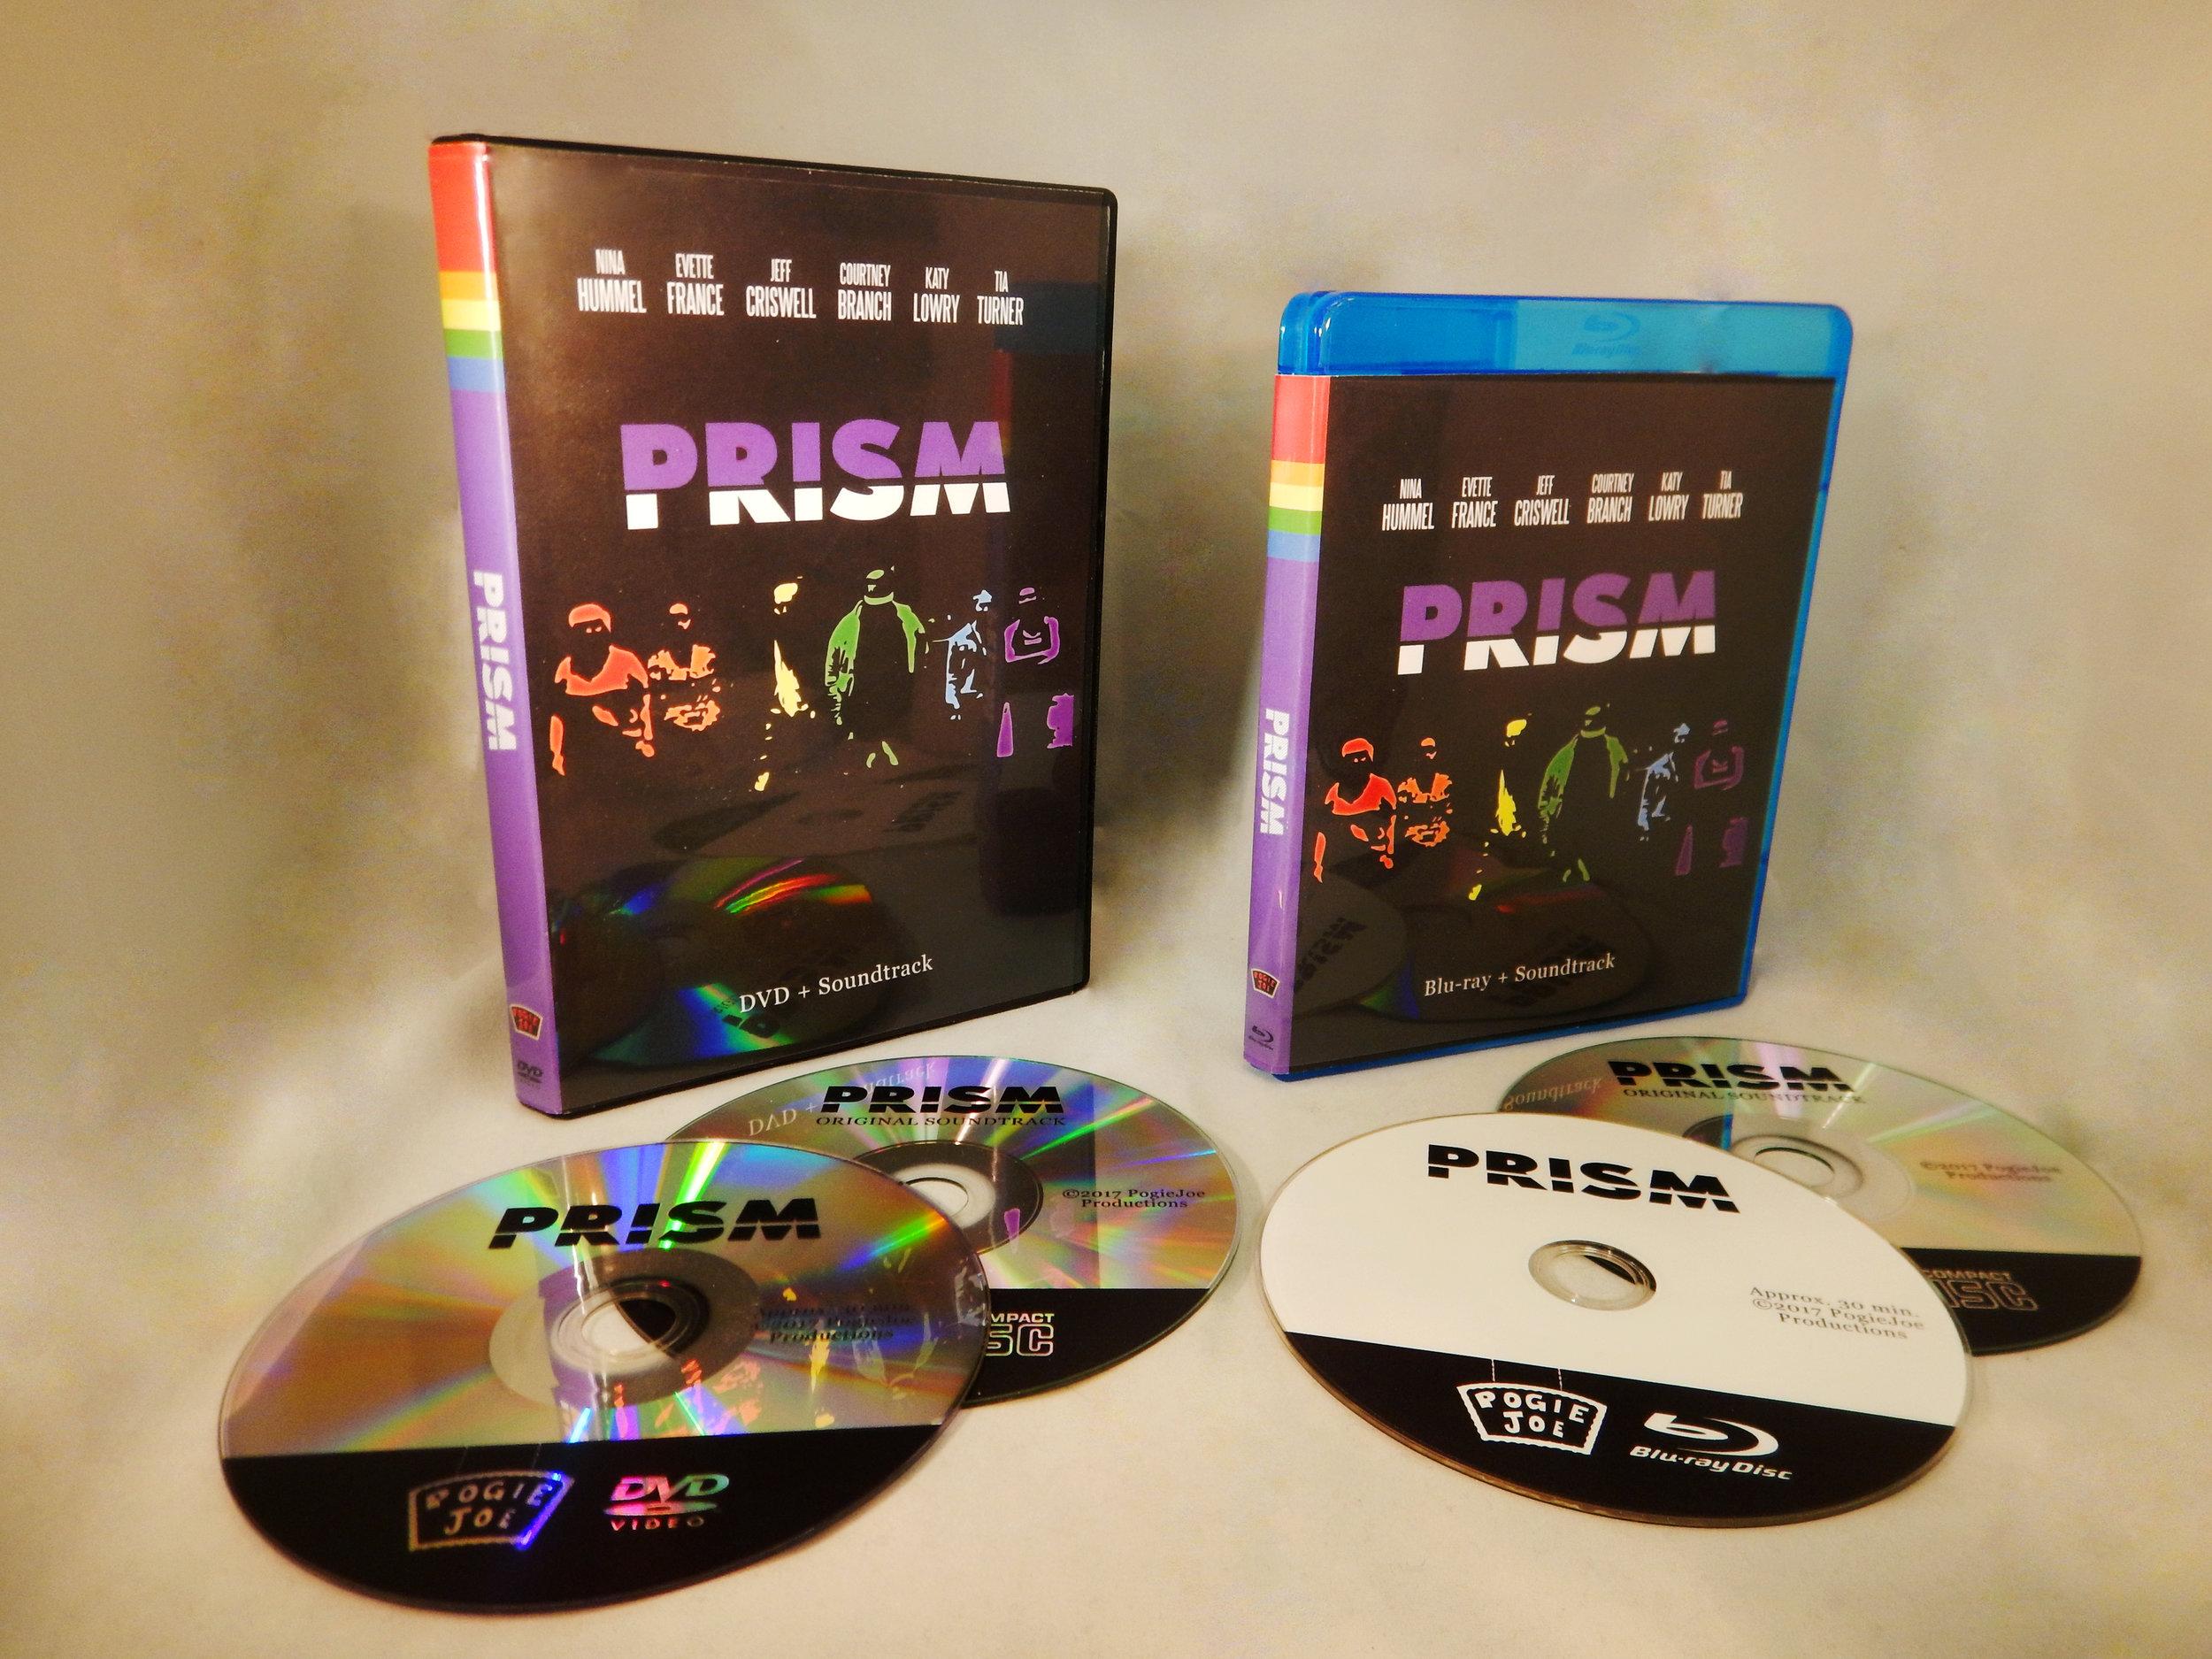 PRISM - Domestic Blu-ray $12International Blu-ray $22Domestic DVD $10International DVD $20